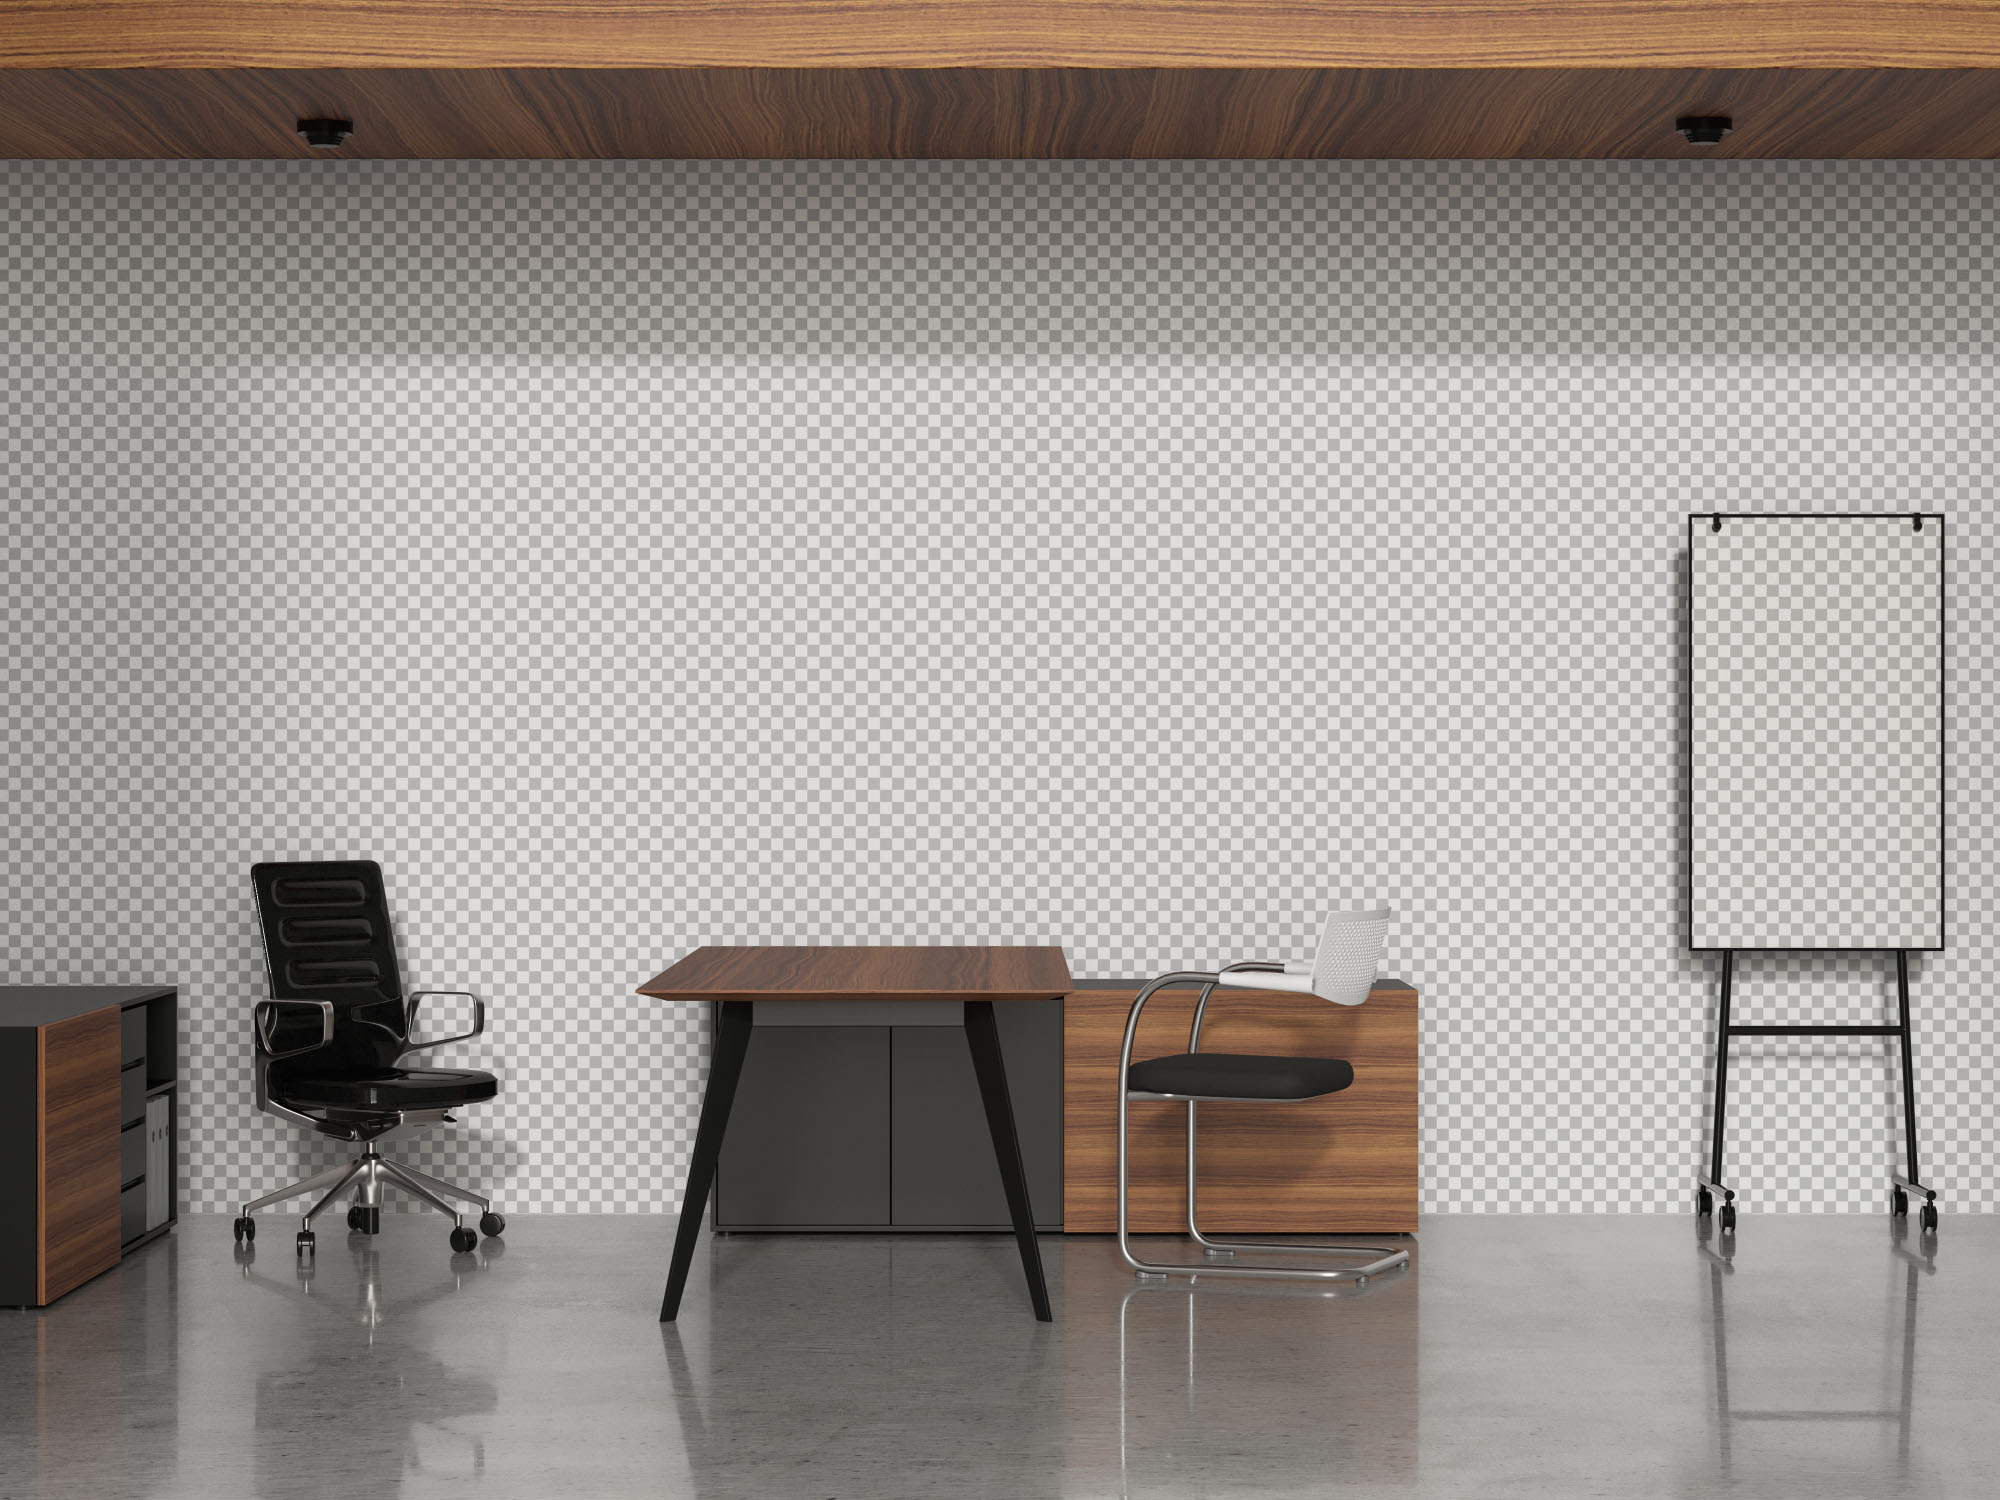 Office Branding Mockup - Transparent